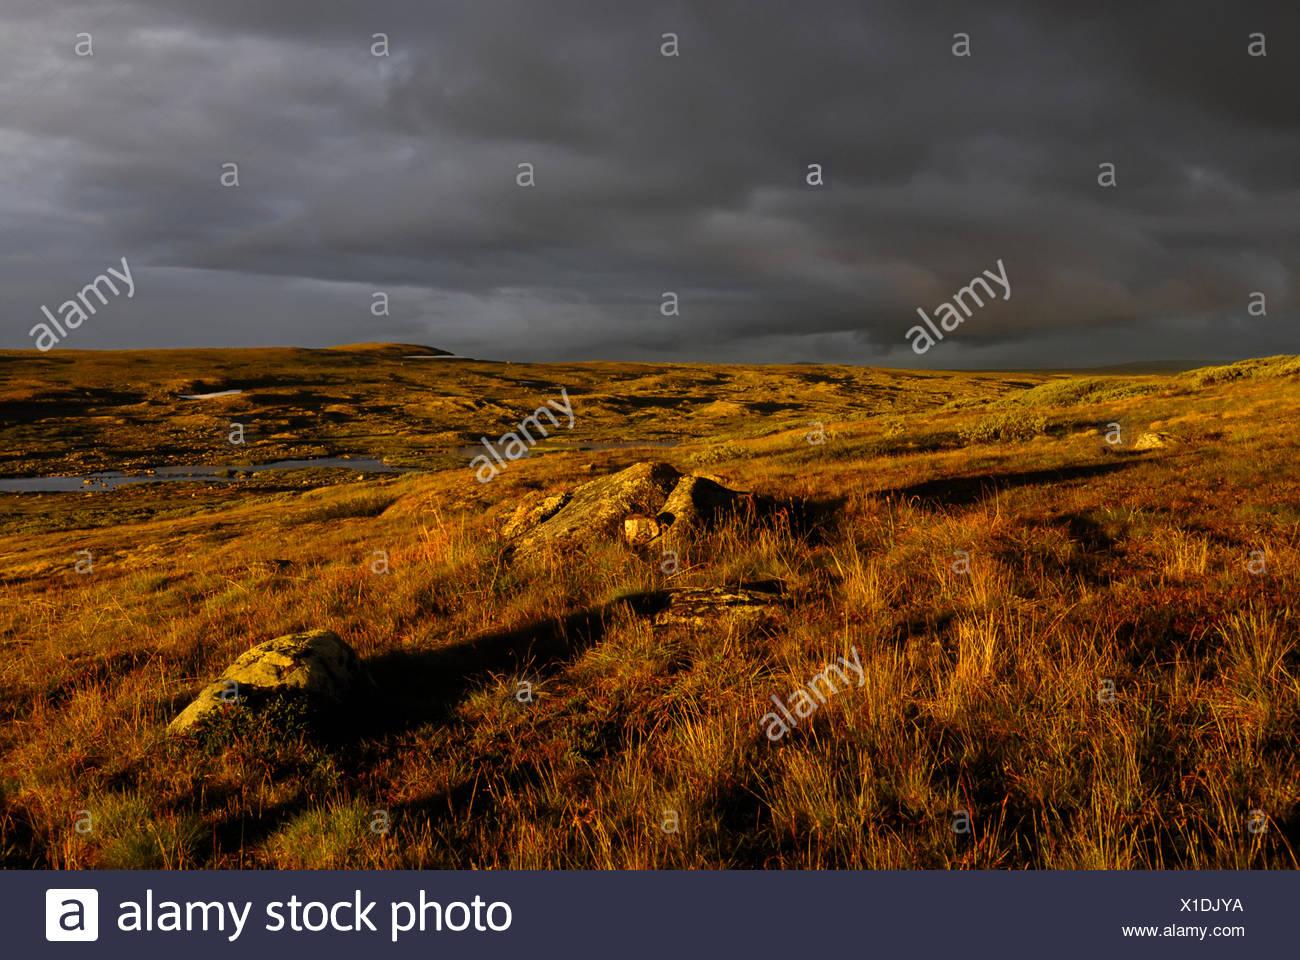 Evening light on the Hardangervidda, Hardanger Vidda, Plateaufjell and Europe's largest high plateau, Norway, Europe - Stock Image